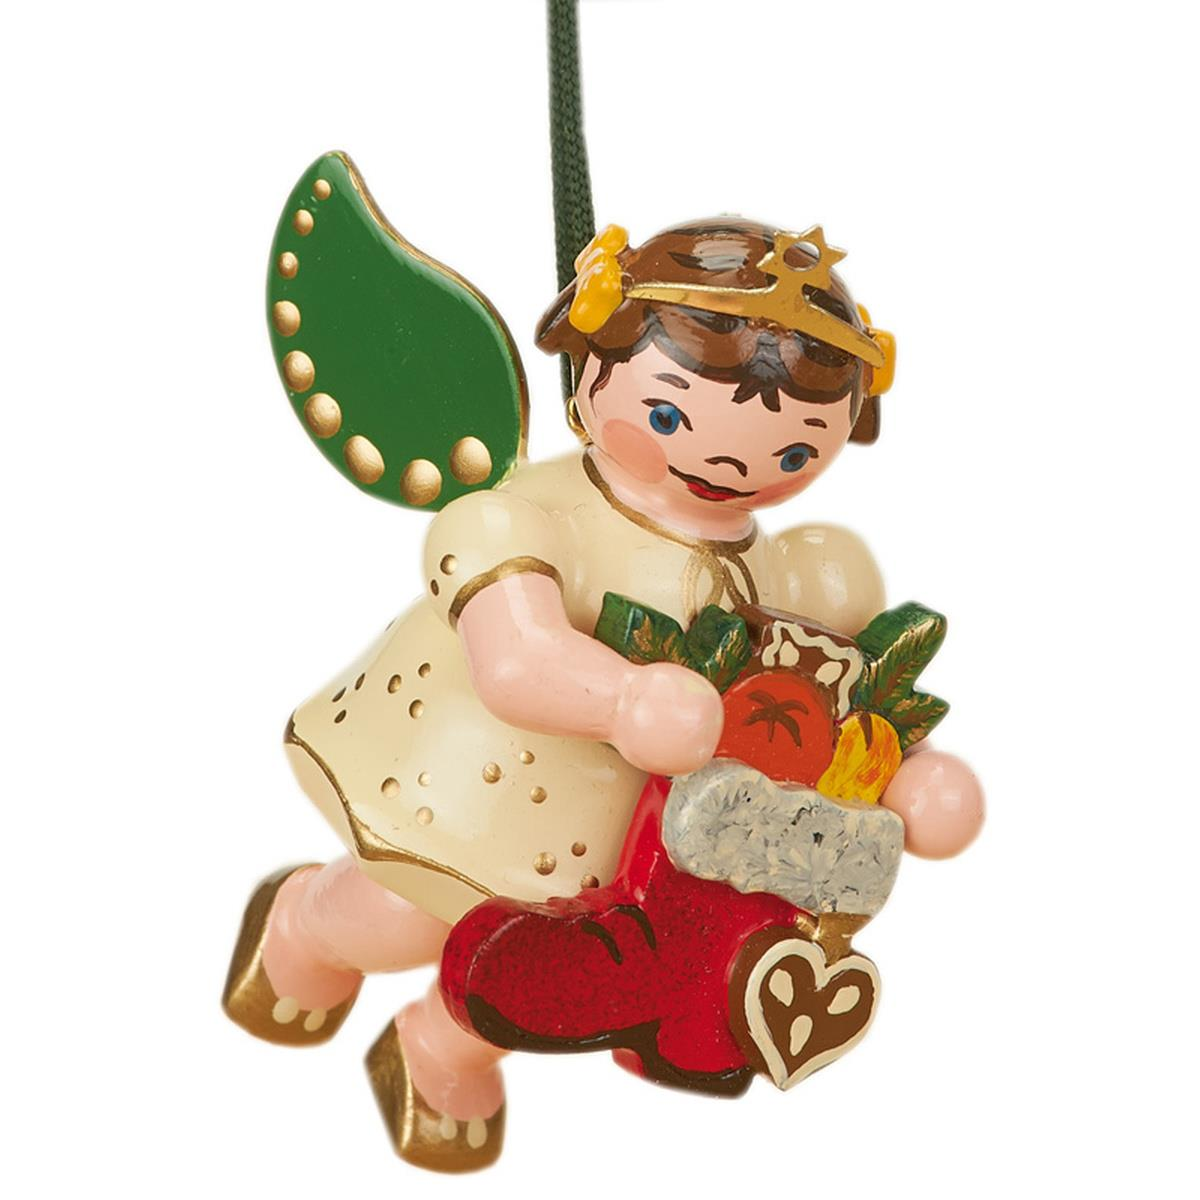 Baumbehang - Engel mit Nikolausstiefel